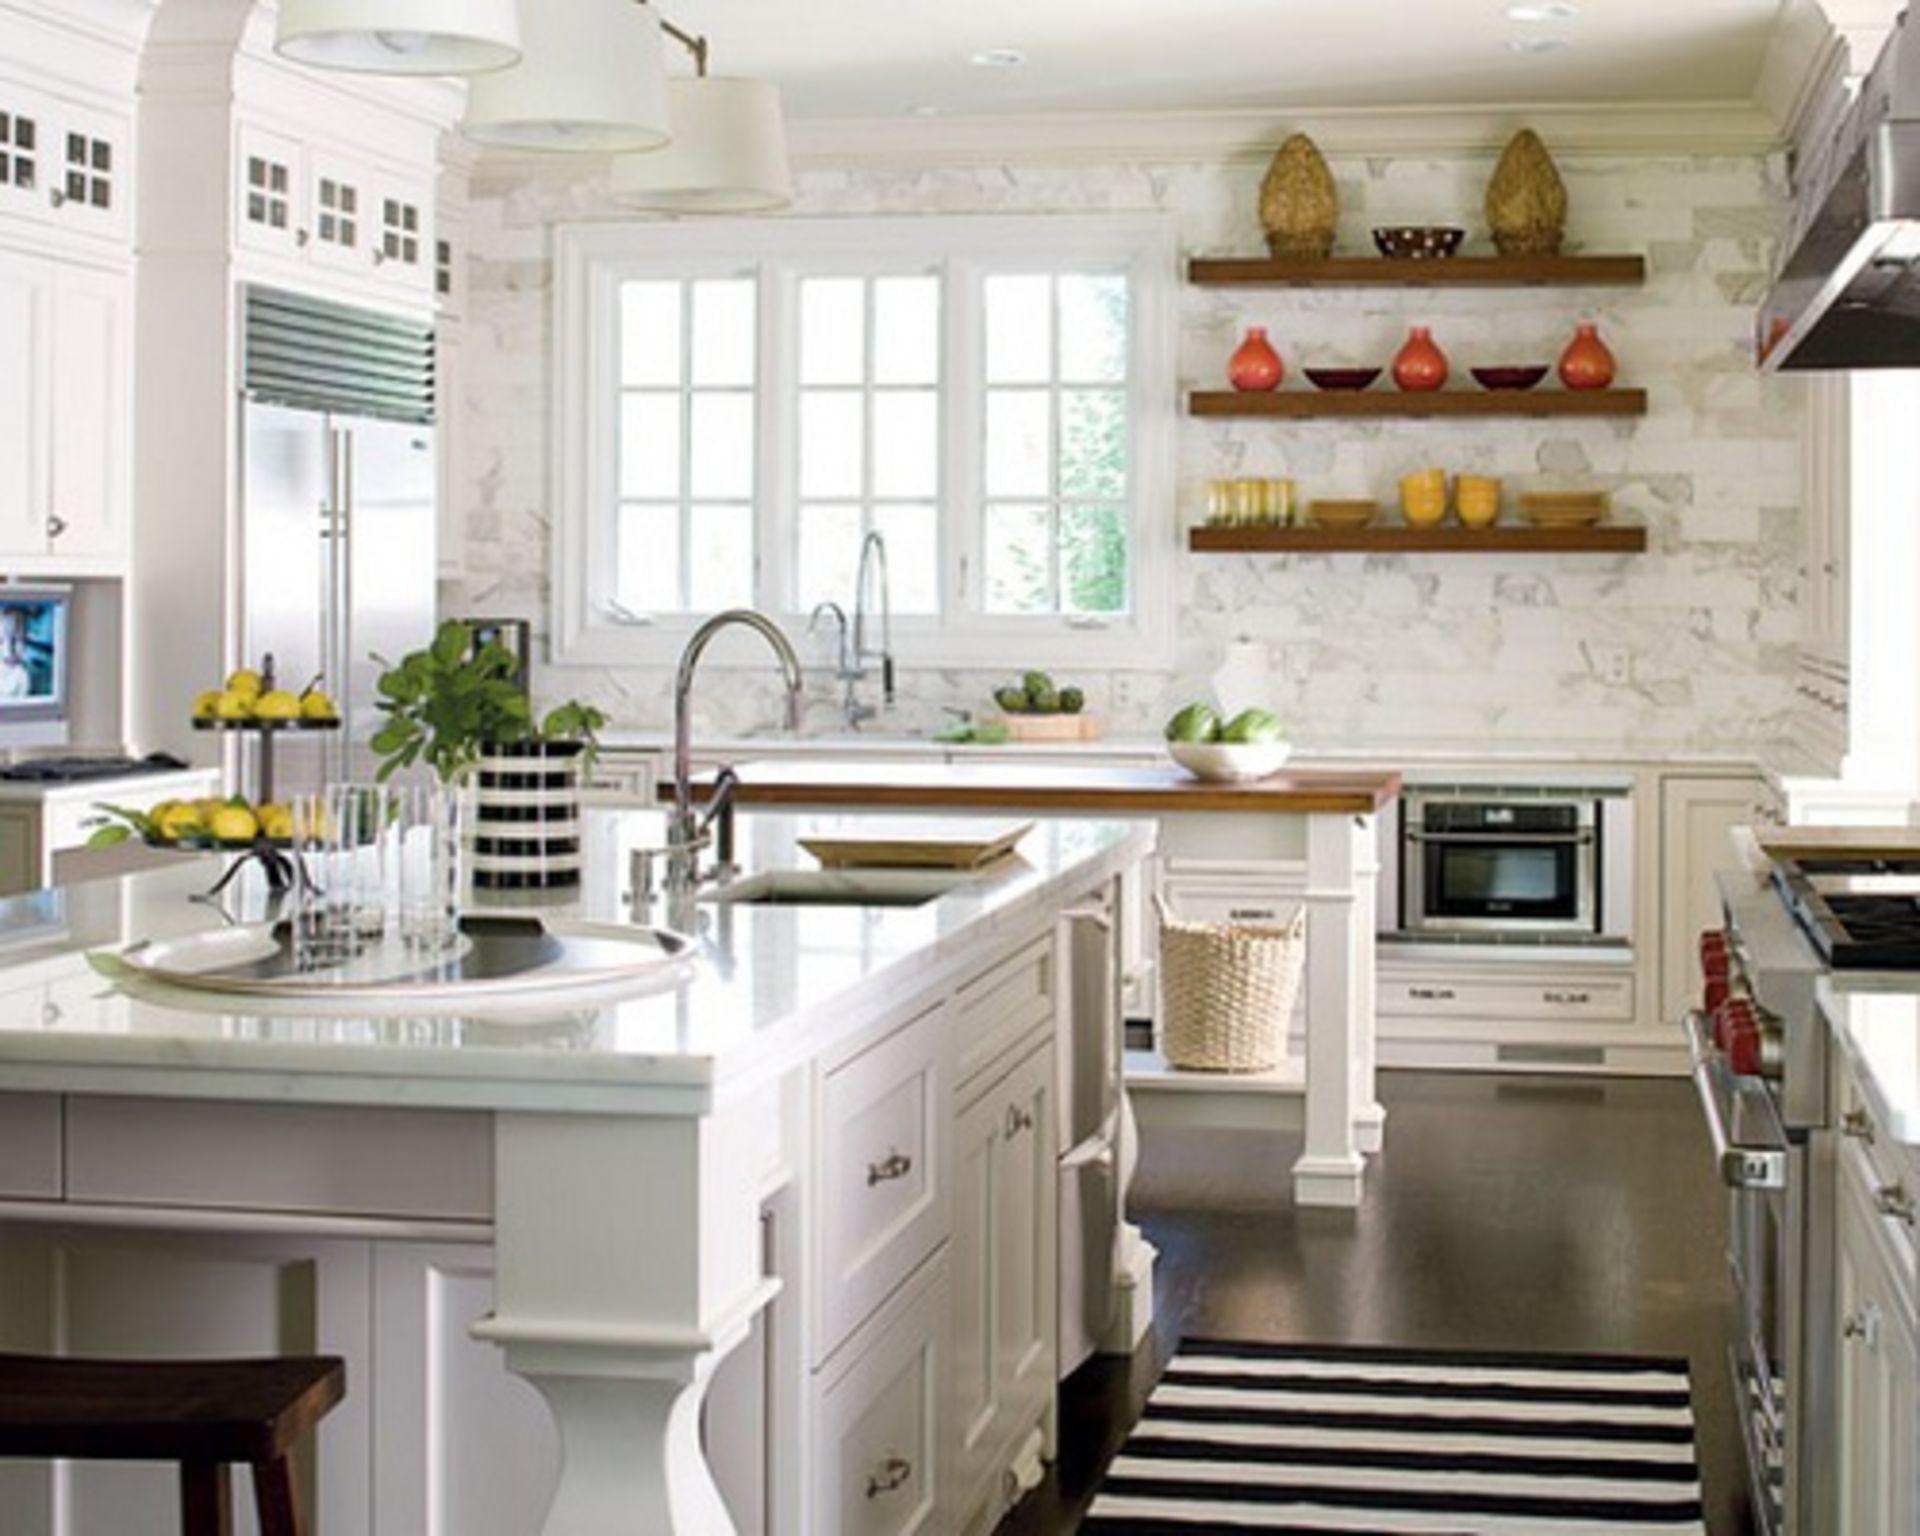 Design Tips: Accenting White Kitchens